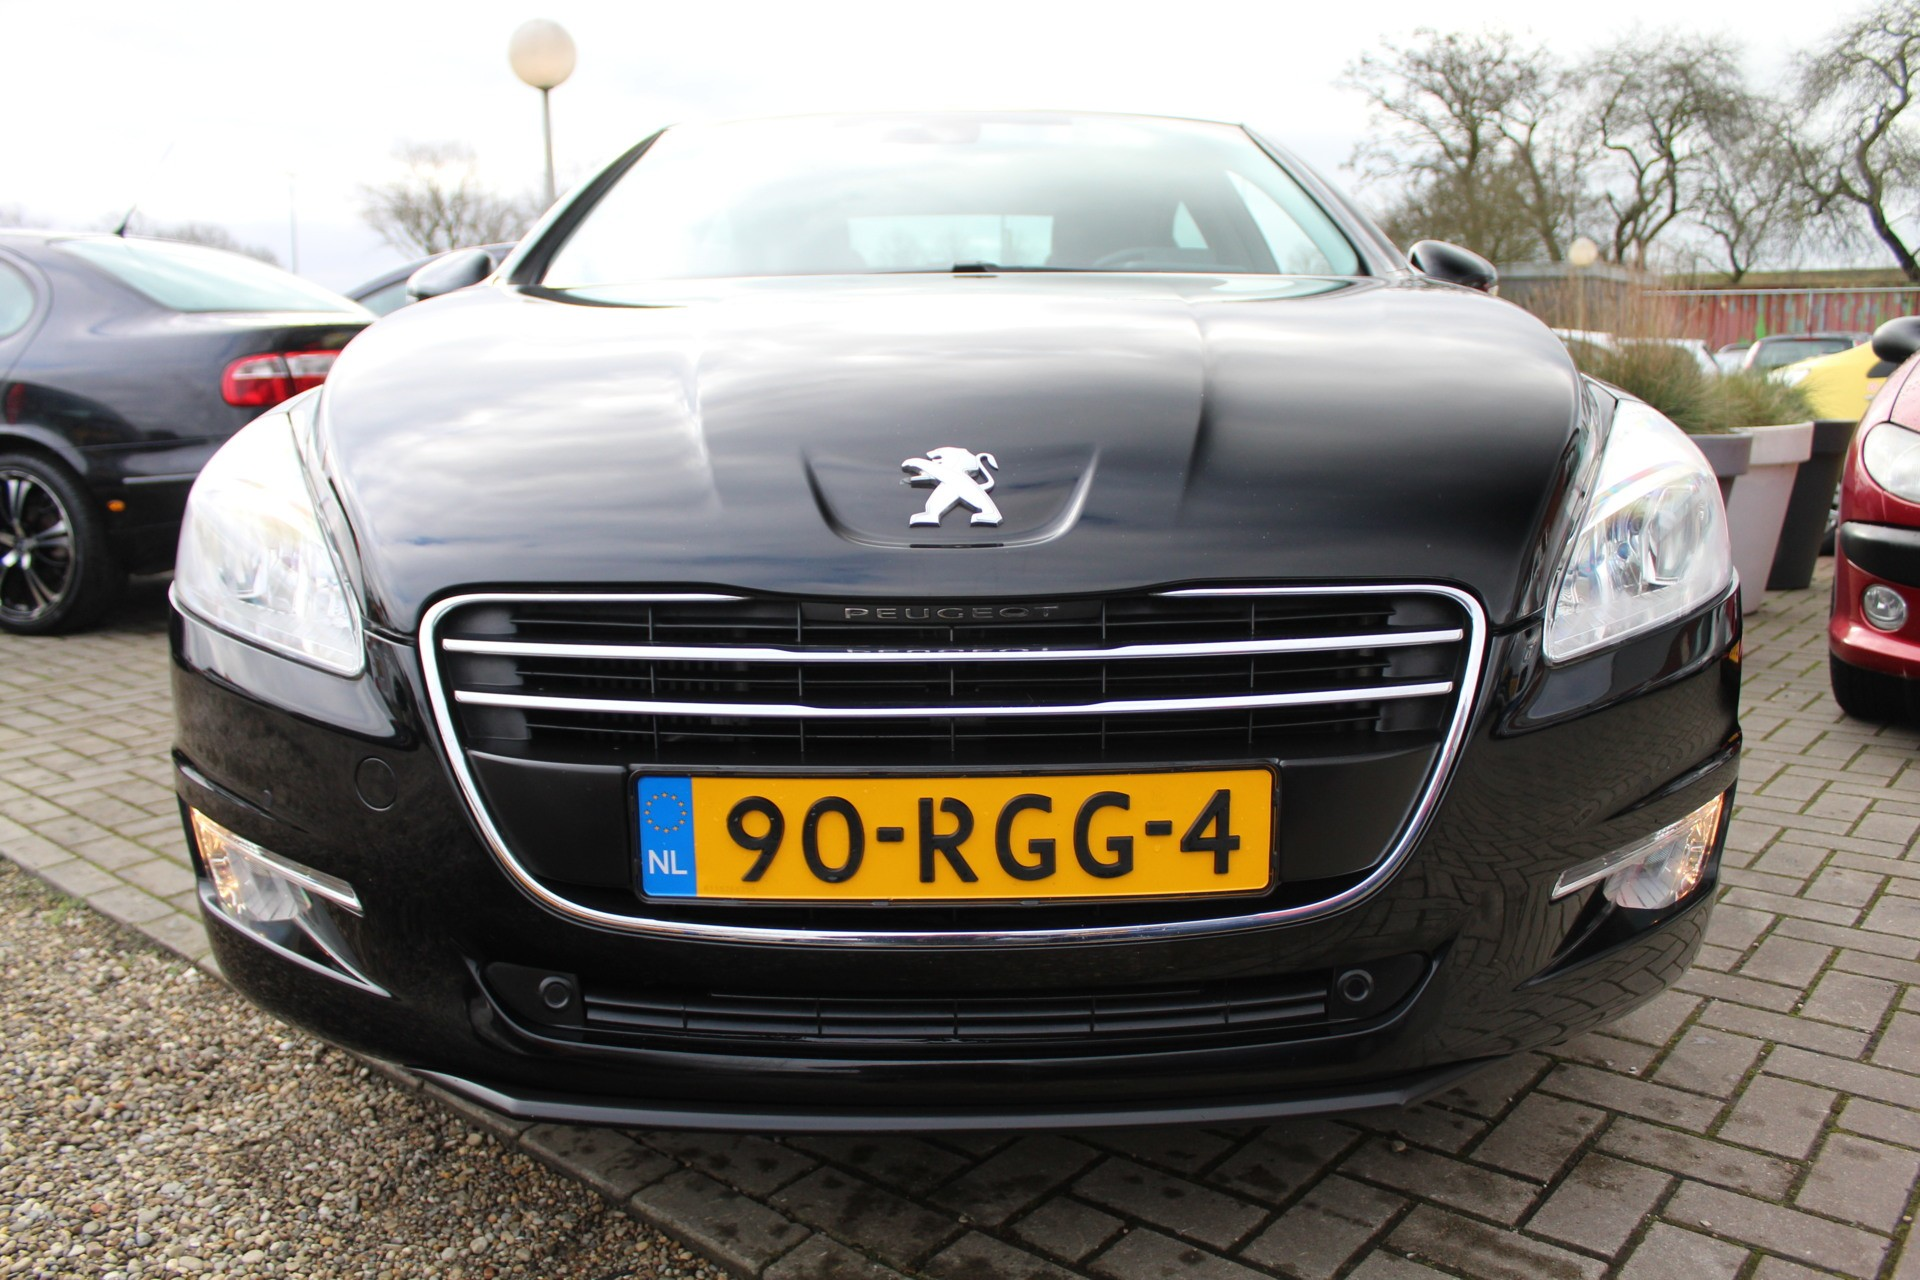 Caroutlet Groningen - Peugeot 508 1.6 THP Allure | NAVI | HUD | LEDER/STOF